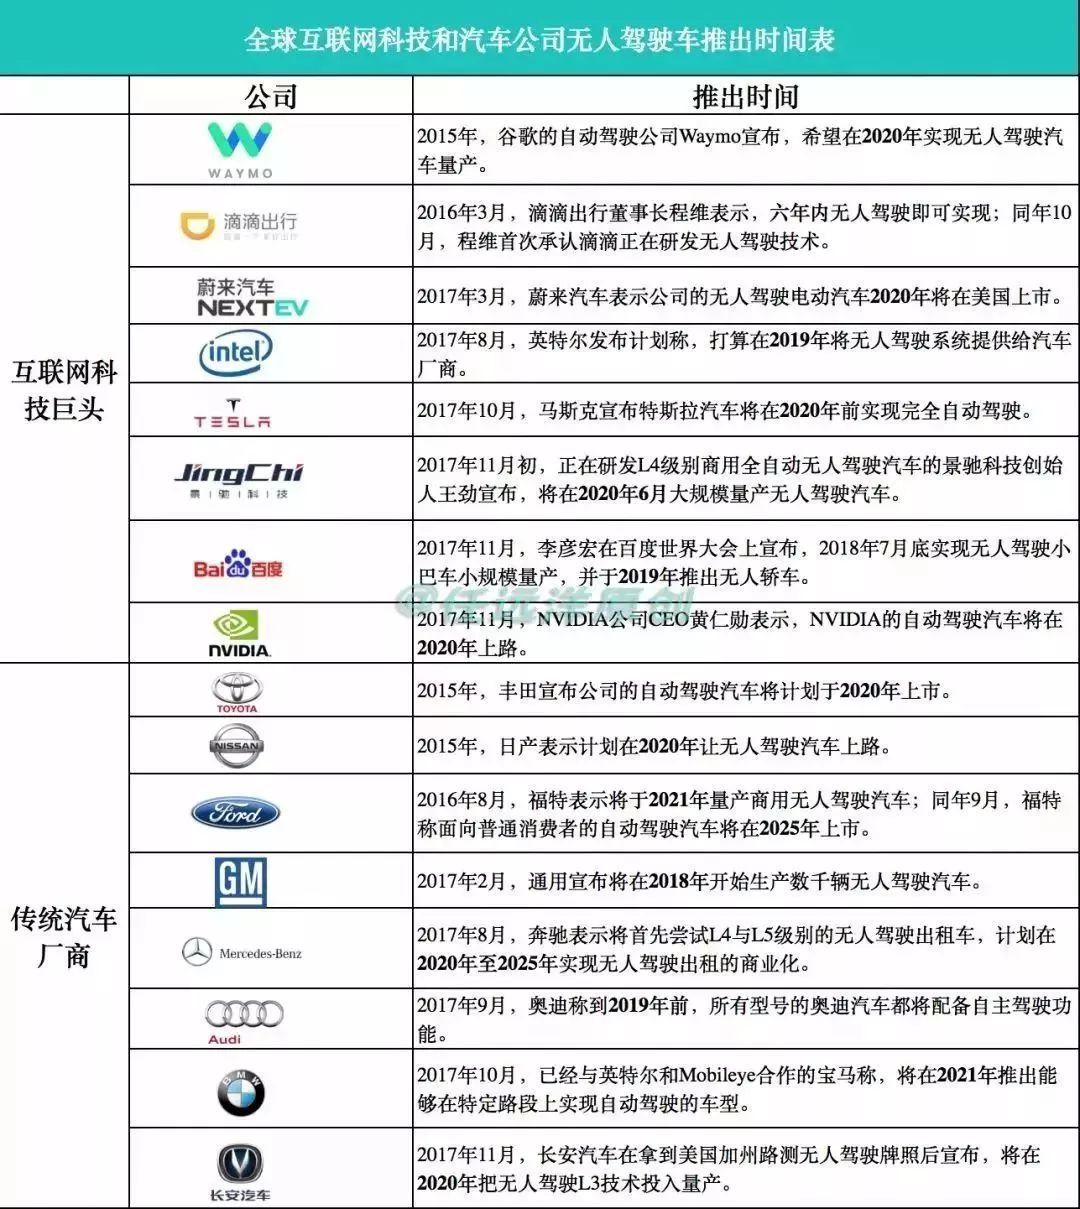 ITS BSCI认证多少钱「上海倾禹企业管理咨询供应」 - 中国保温网